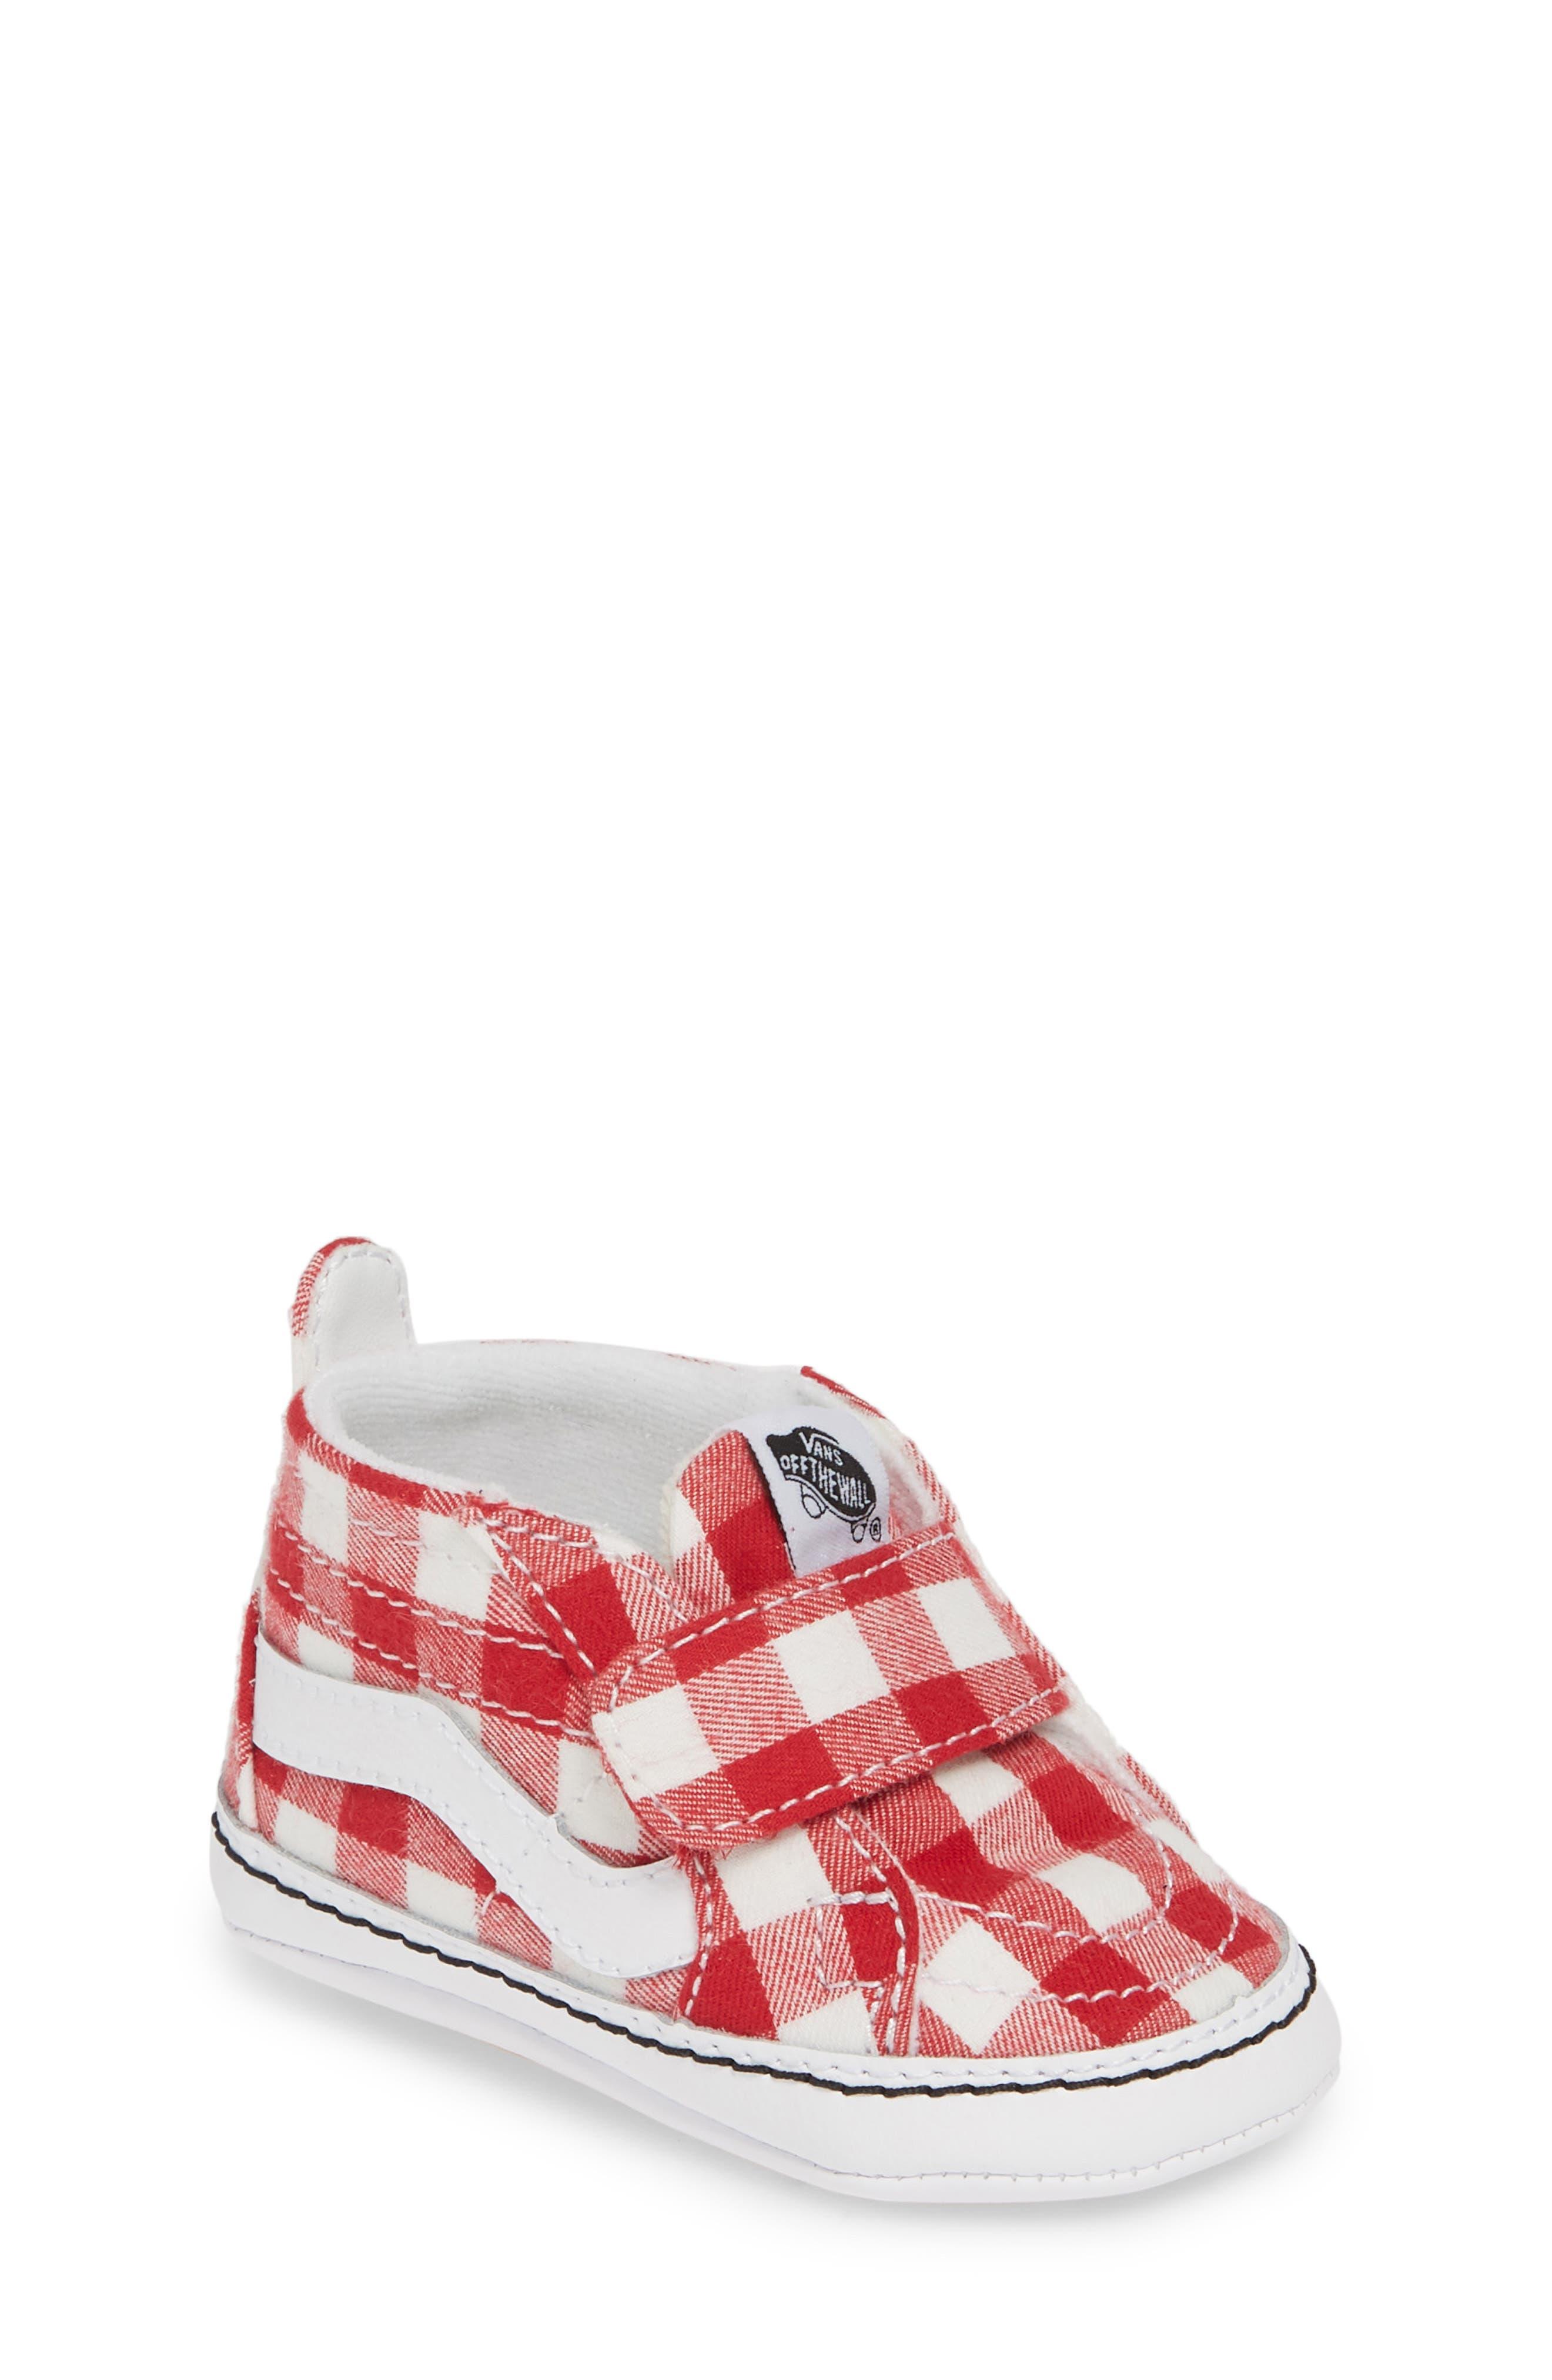 52138b8dd242 Baby Girl Vans Shoes